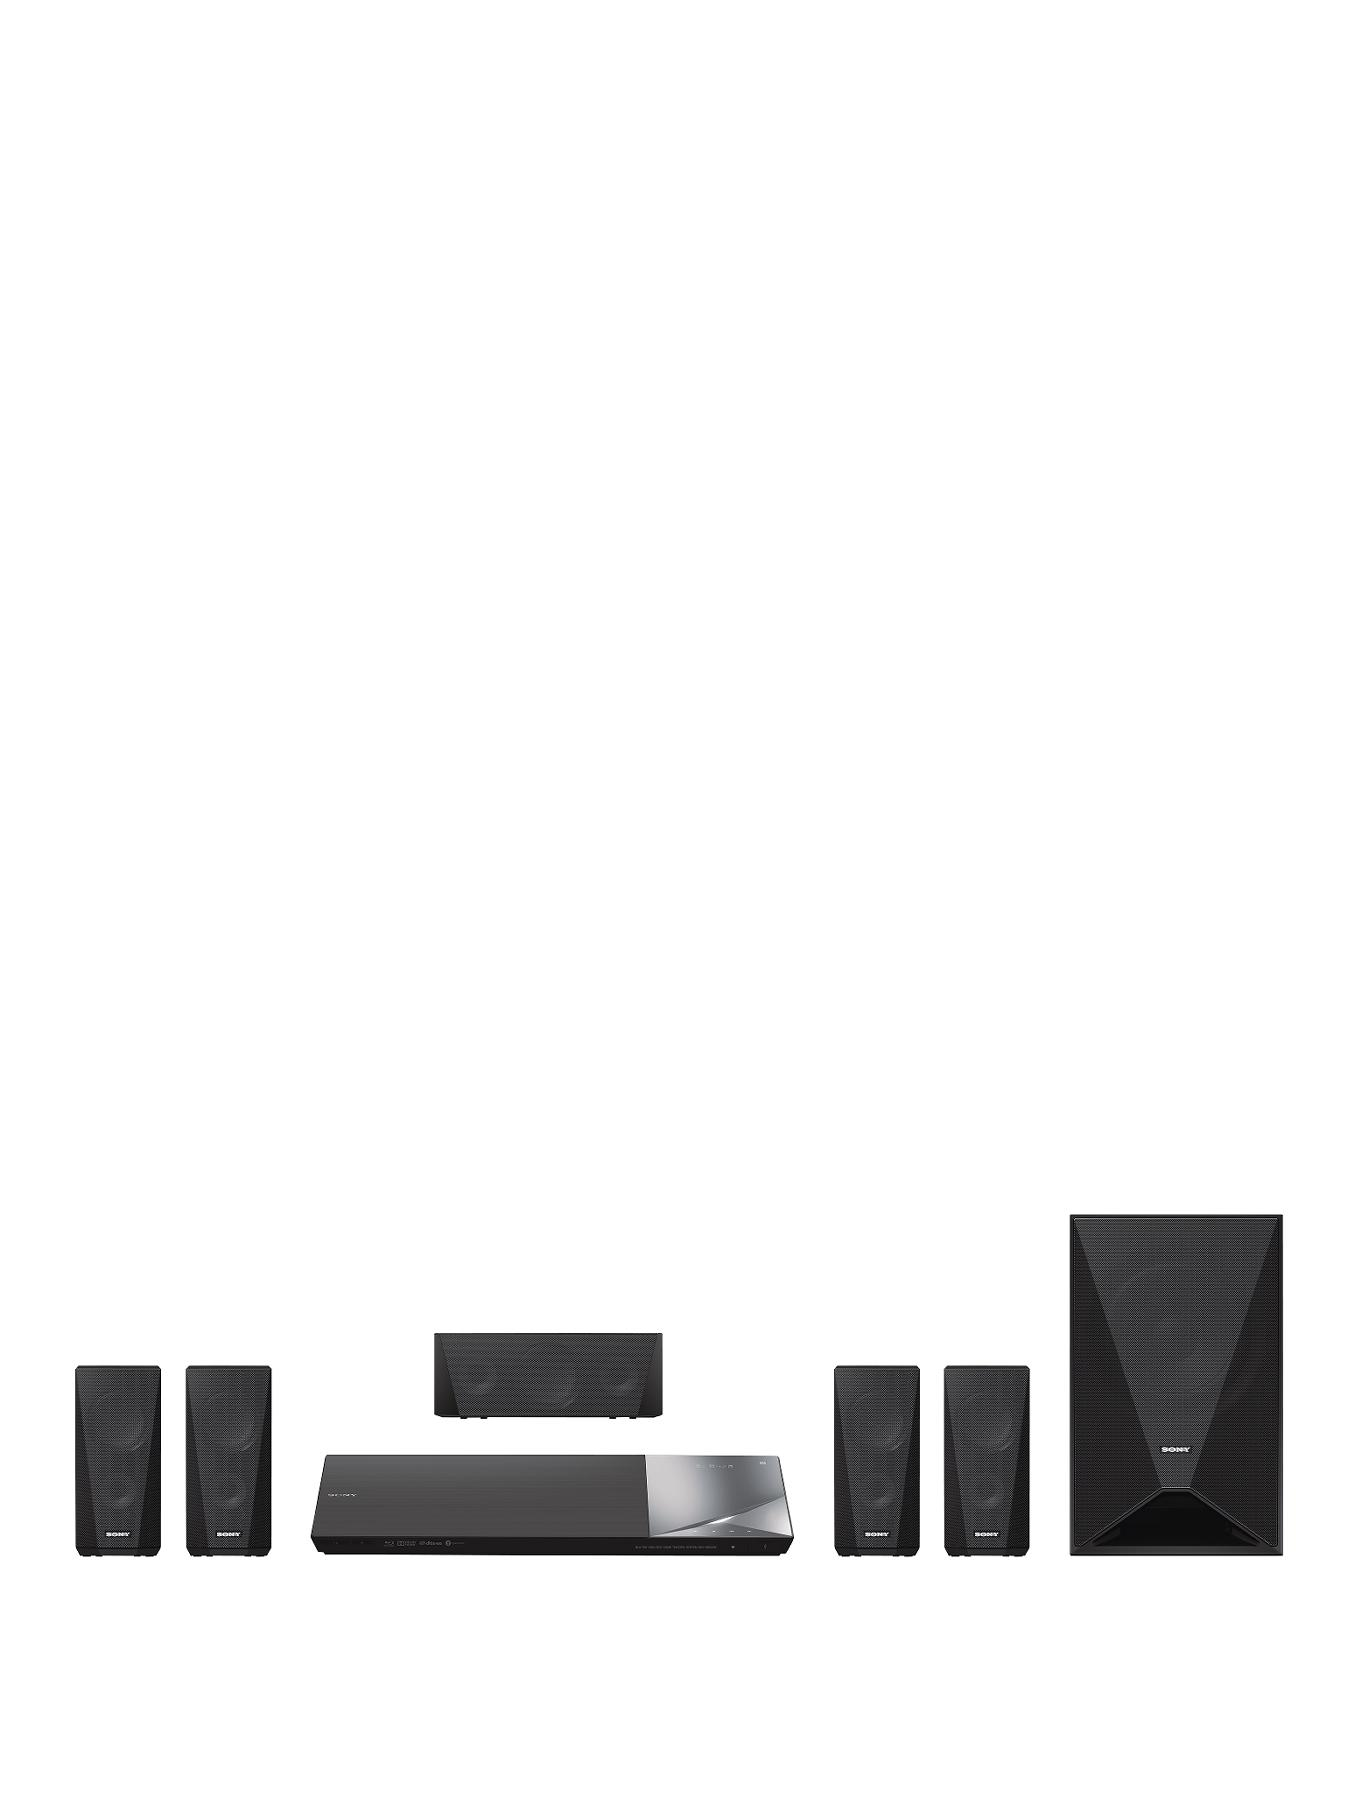 Sony BDVN5200 3D Blu-ray Home Cinema System